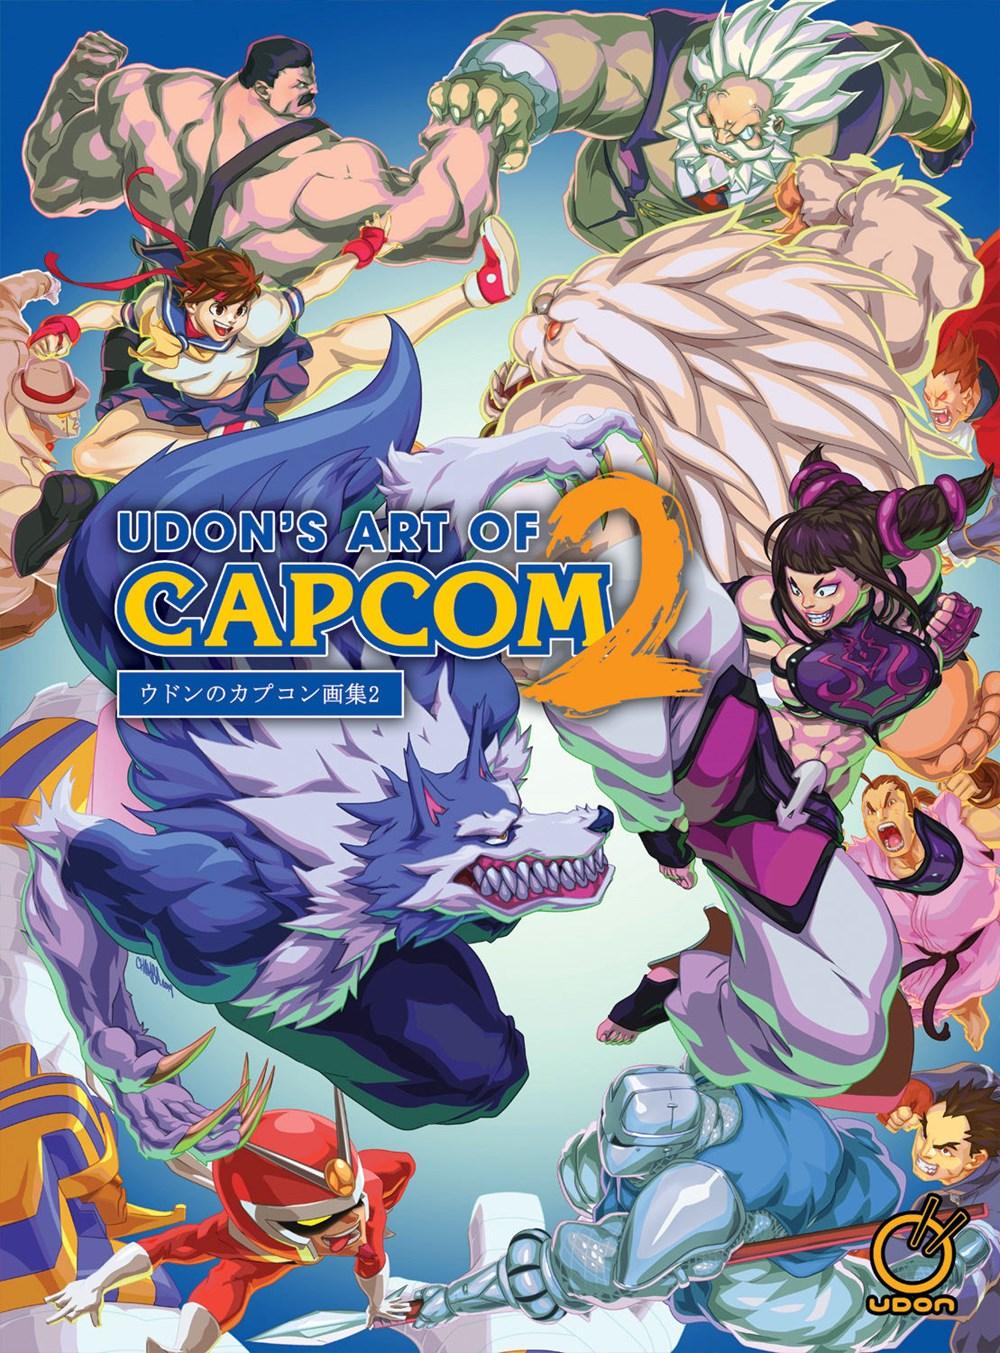 Udons Art of Capcom Volume 2 Artbook (Hardcover)